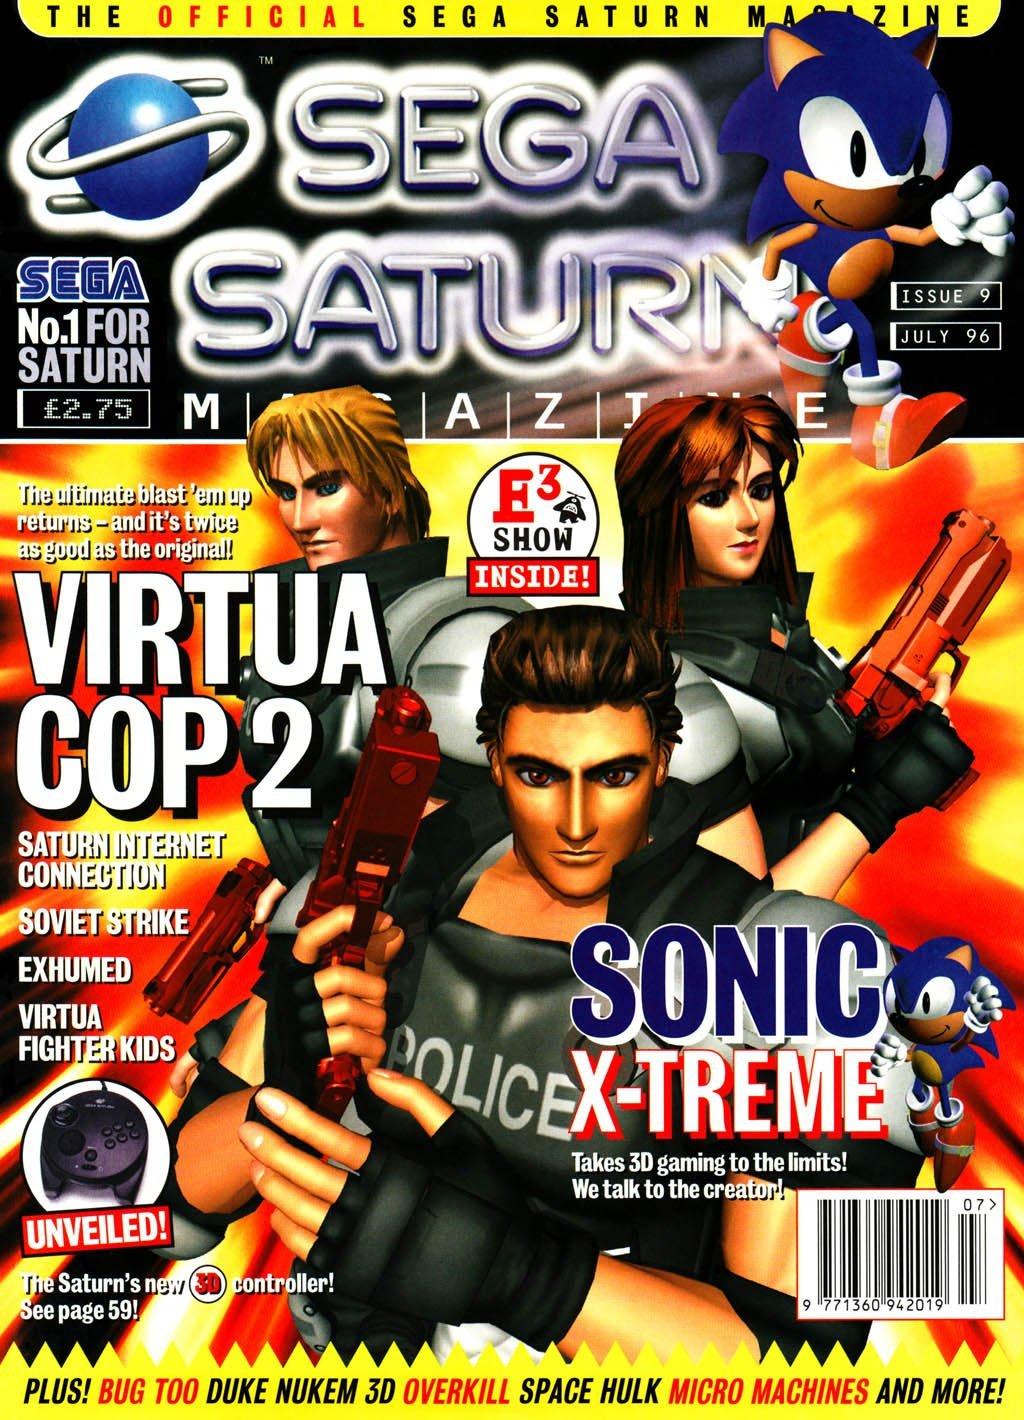 Official Sega Saturn Magazine 09 (July 1996)